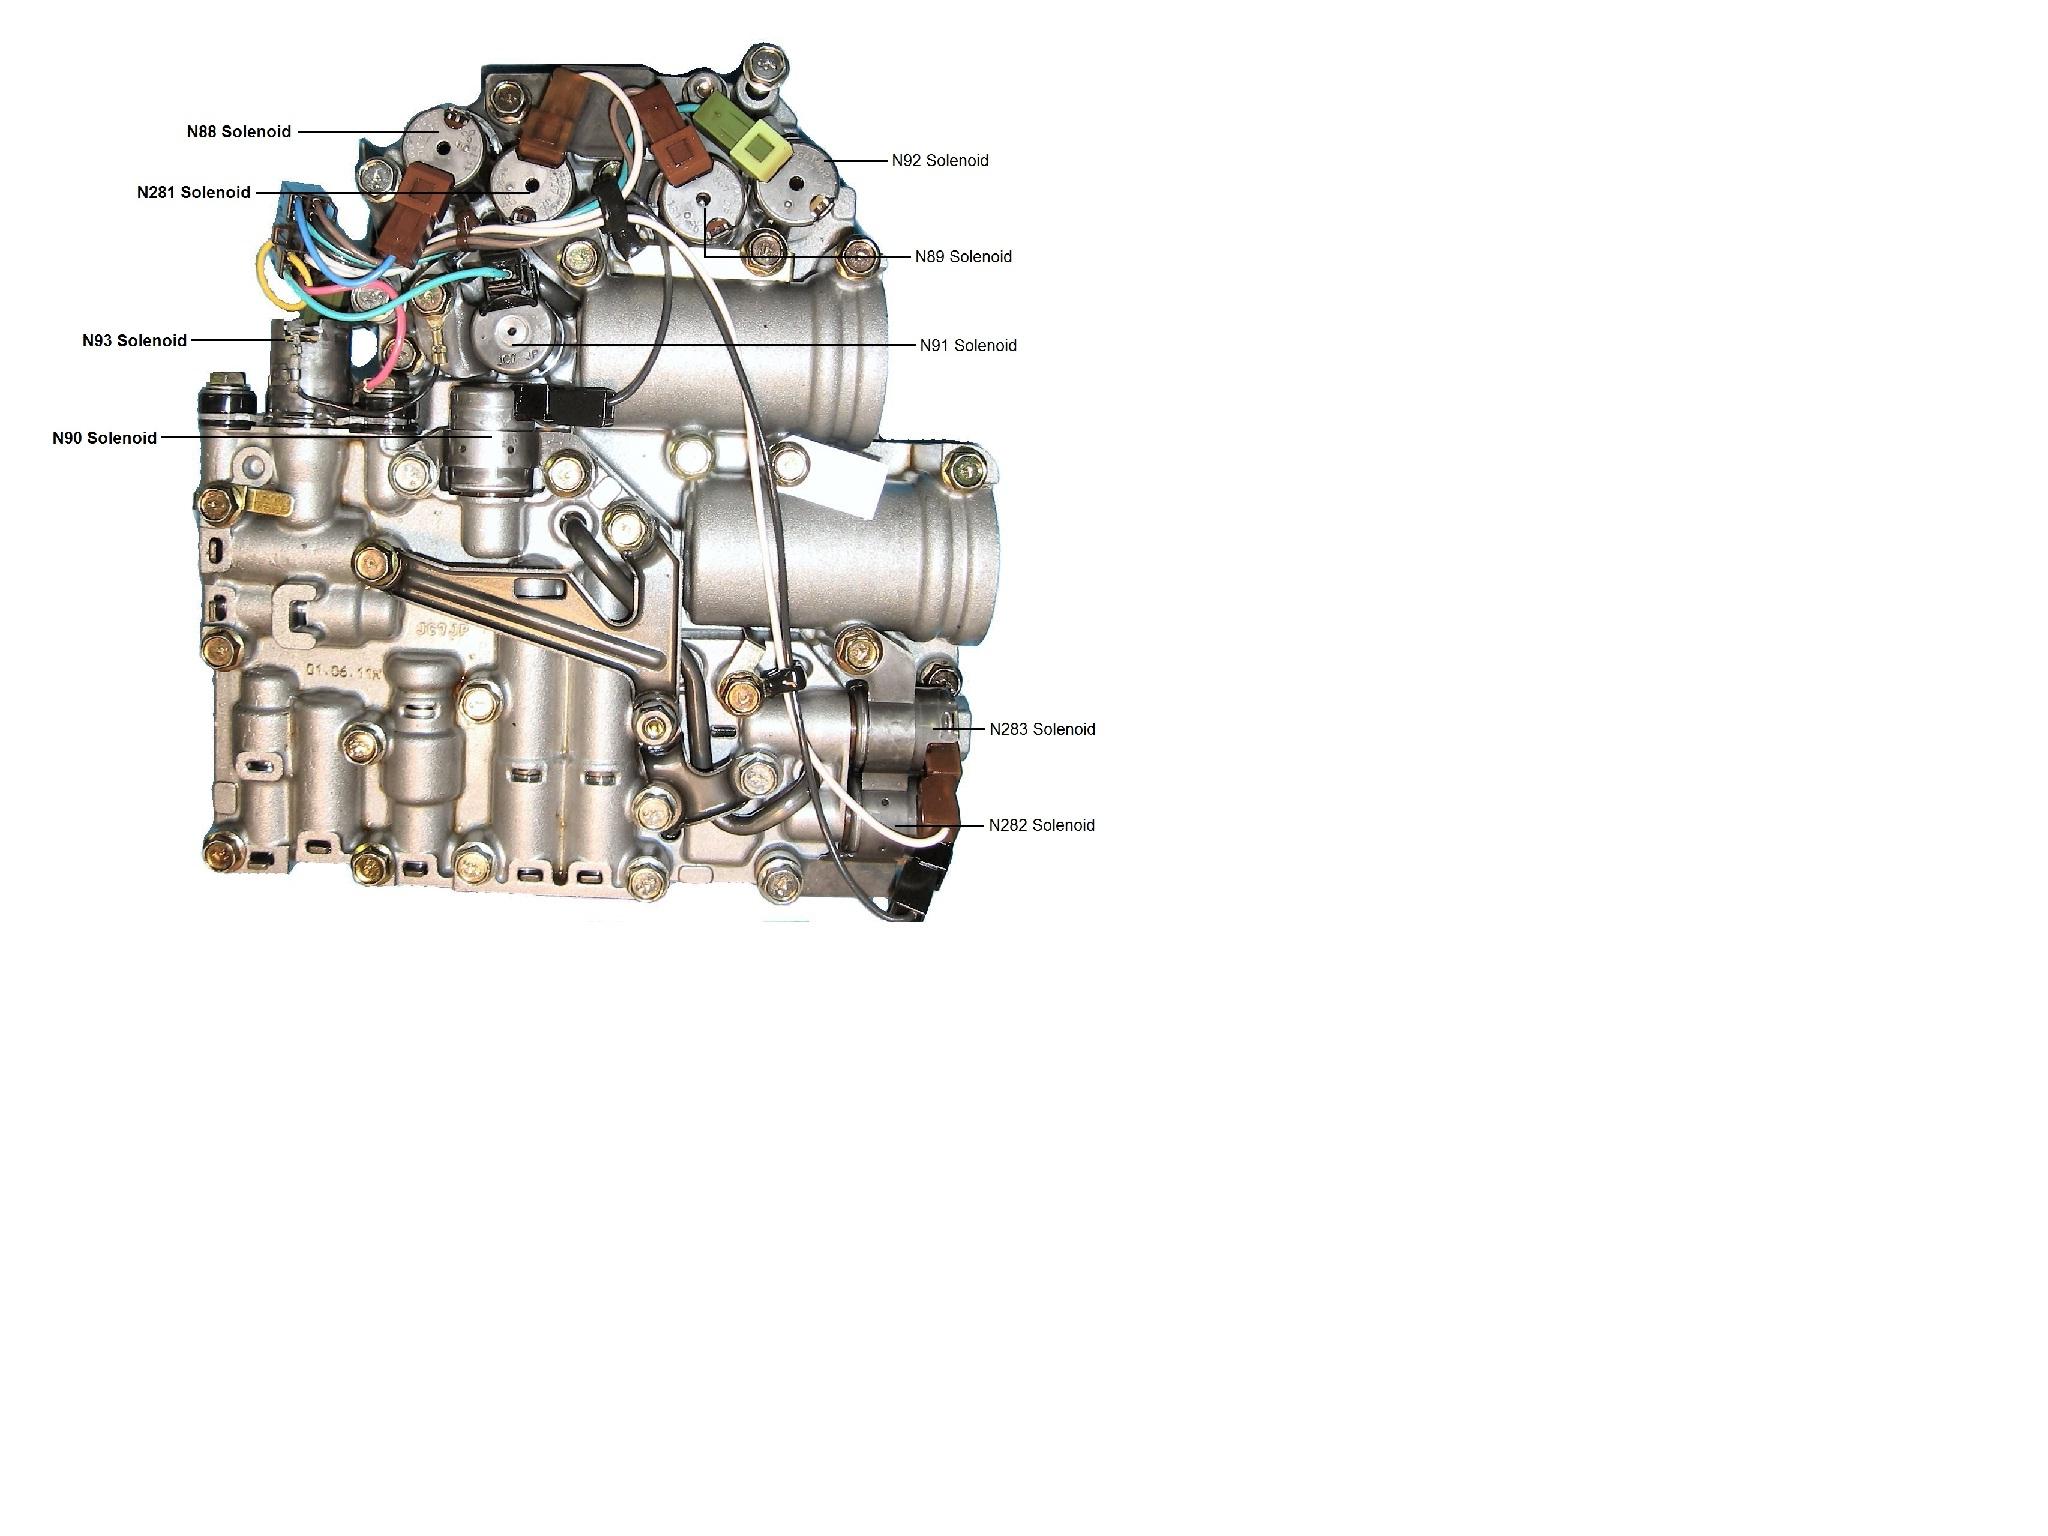 4497ccb9-a228-4280-a659-426860de0280_2000 Jetta Trans solenoids.jpg